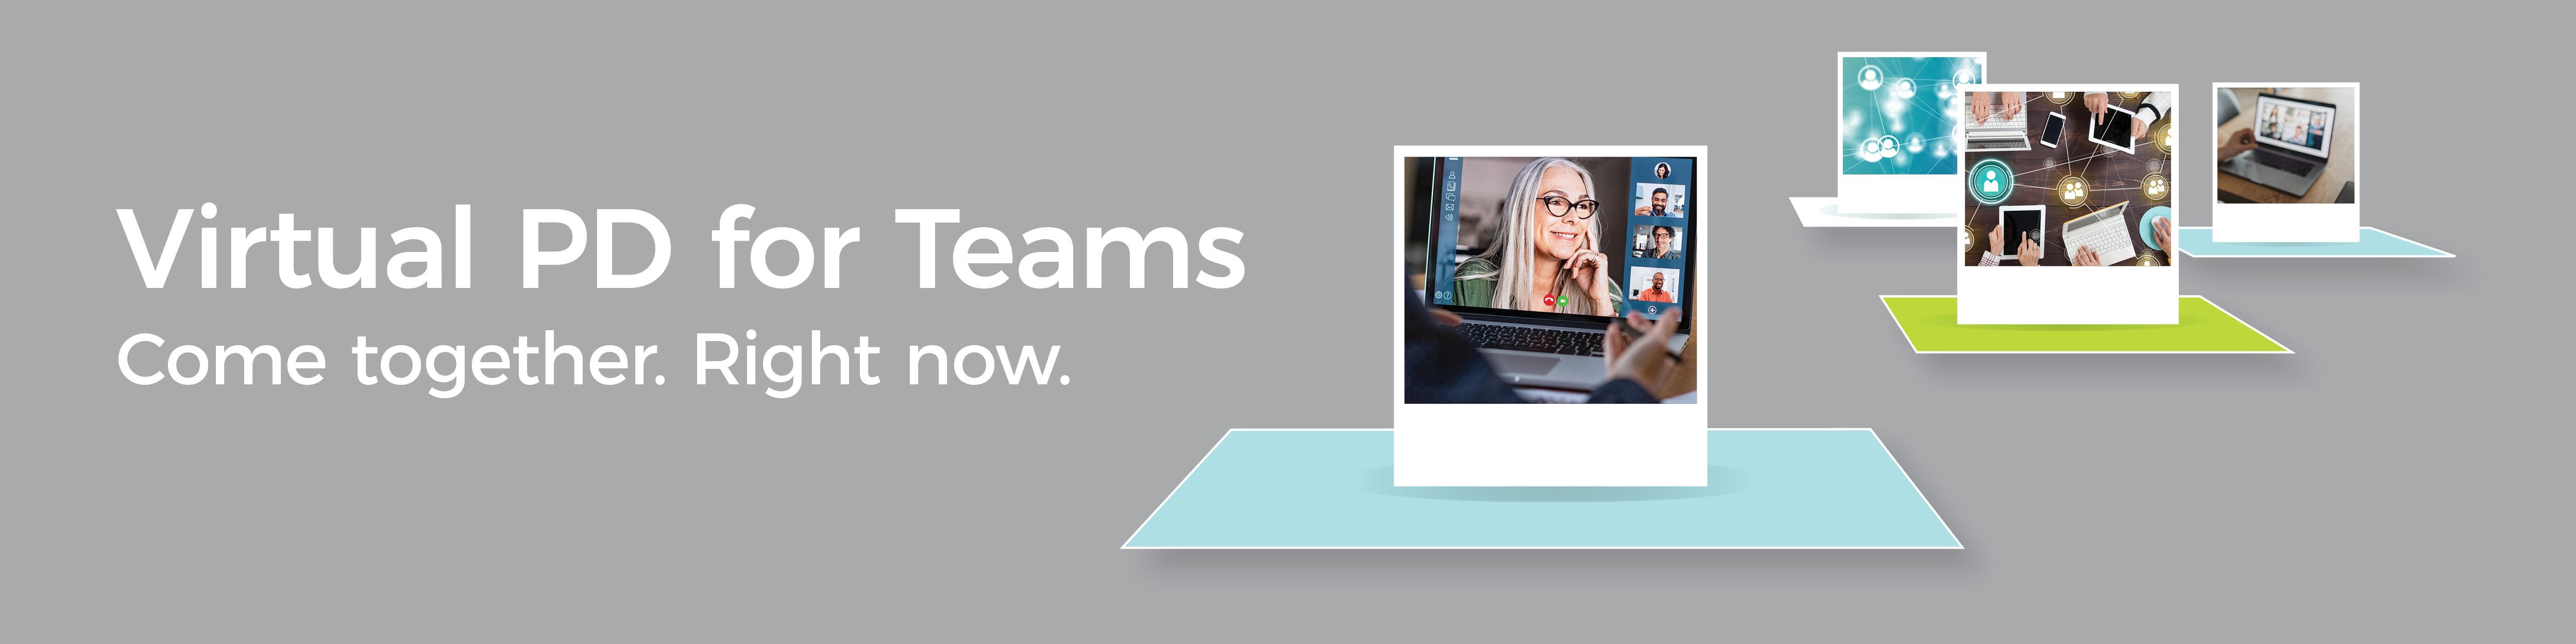 virtual PD for teams